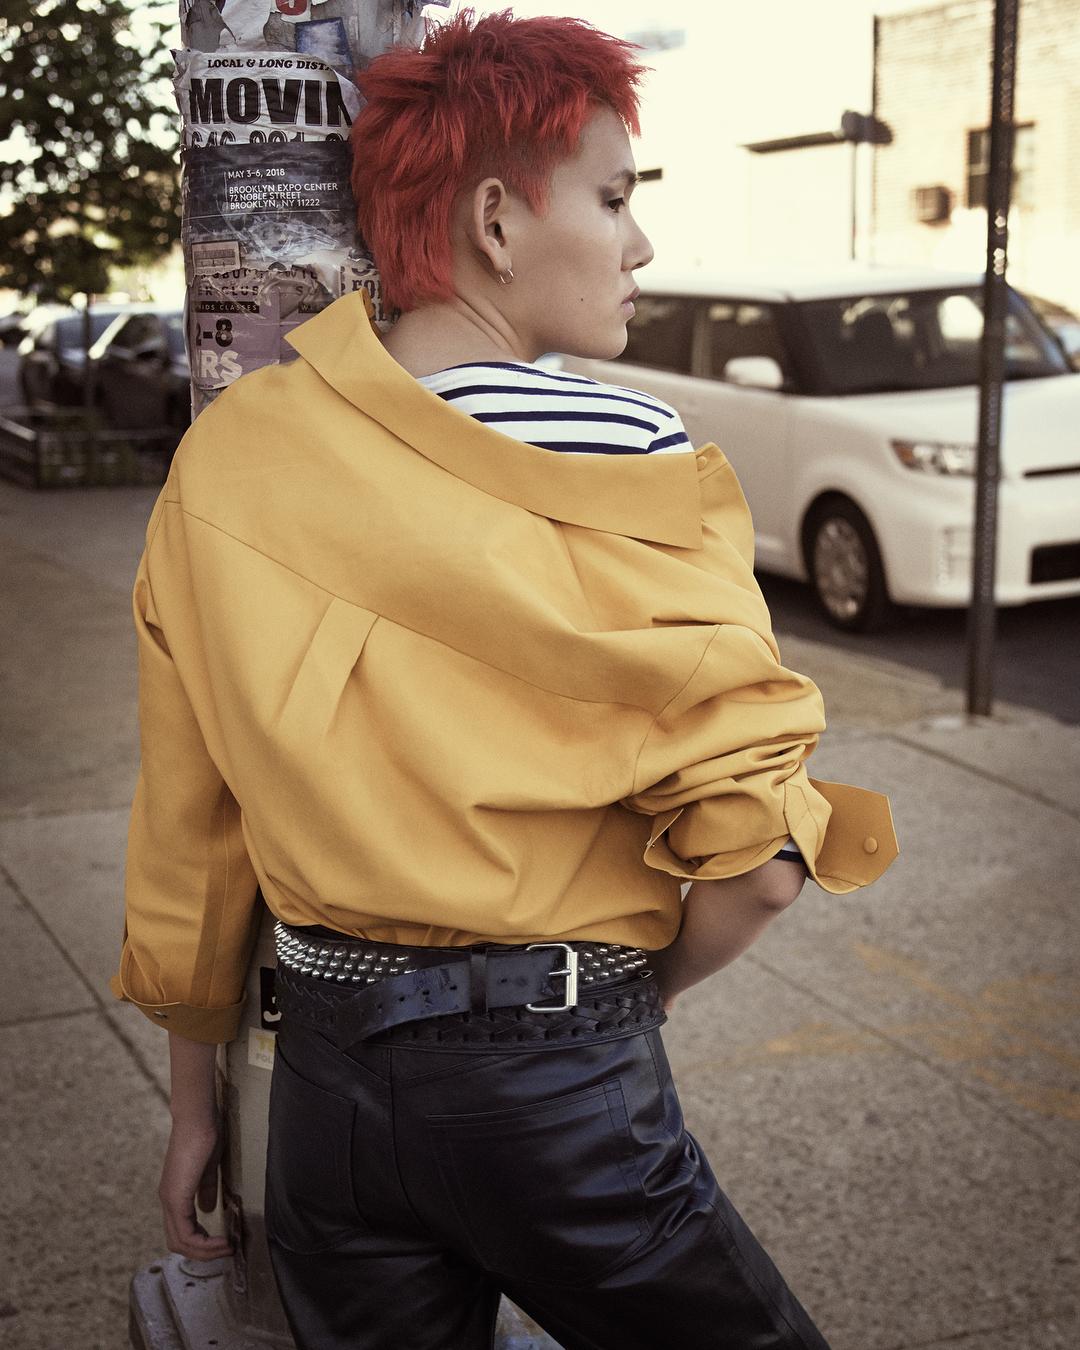 EZ Vogue Italia - The Hive Management